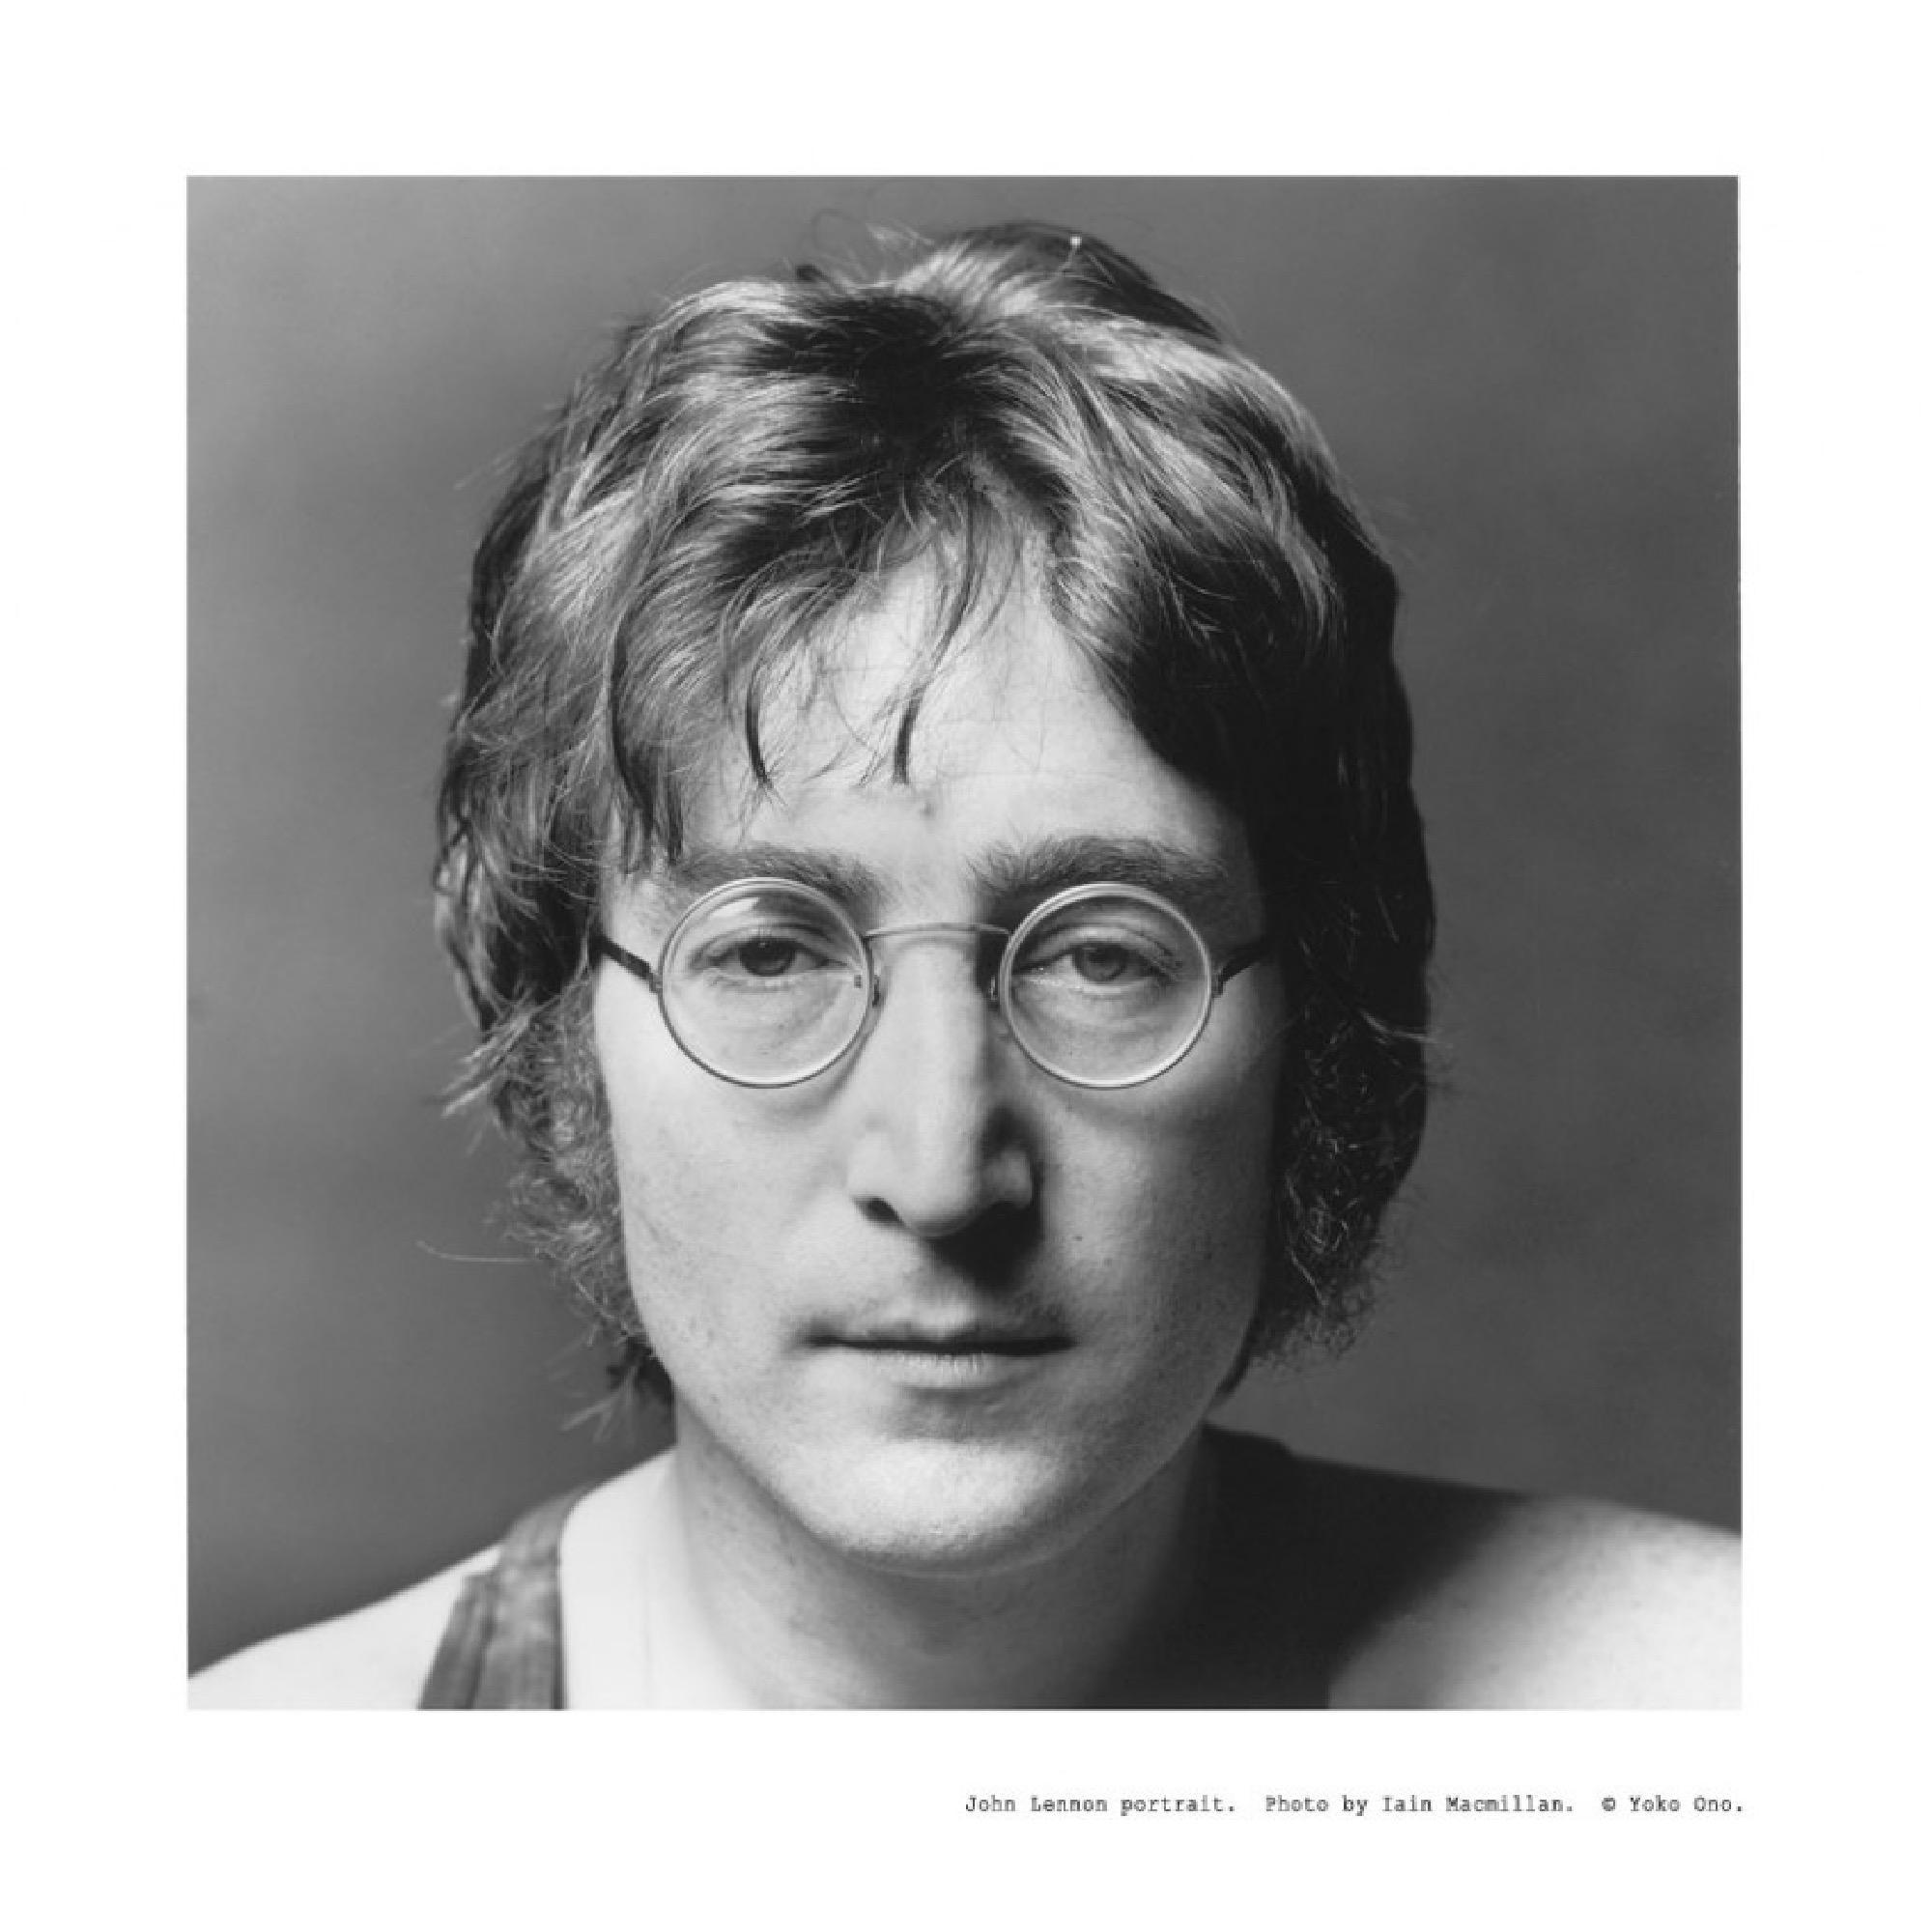 727. Describing John Lennon / Adjectives of Personality J-Z (with Antony Rotunno)